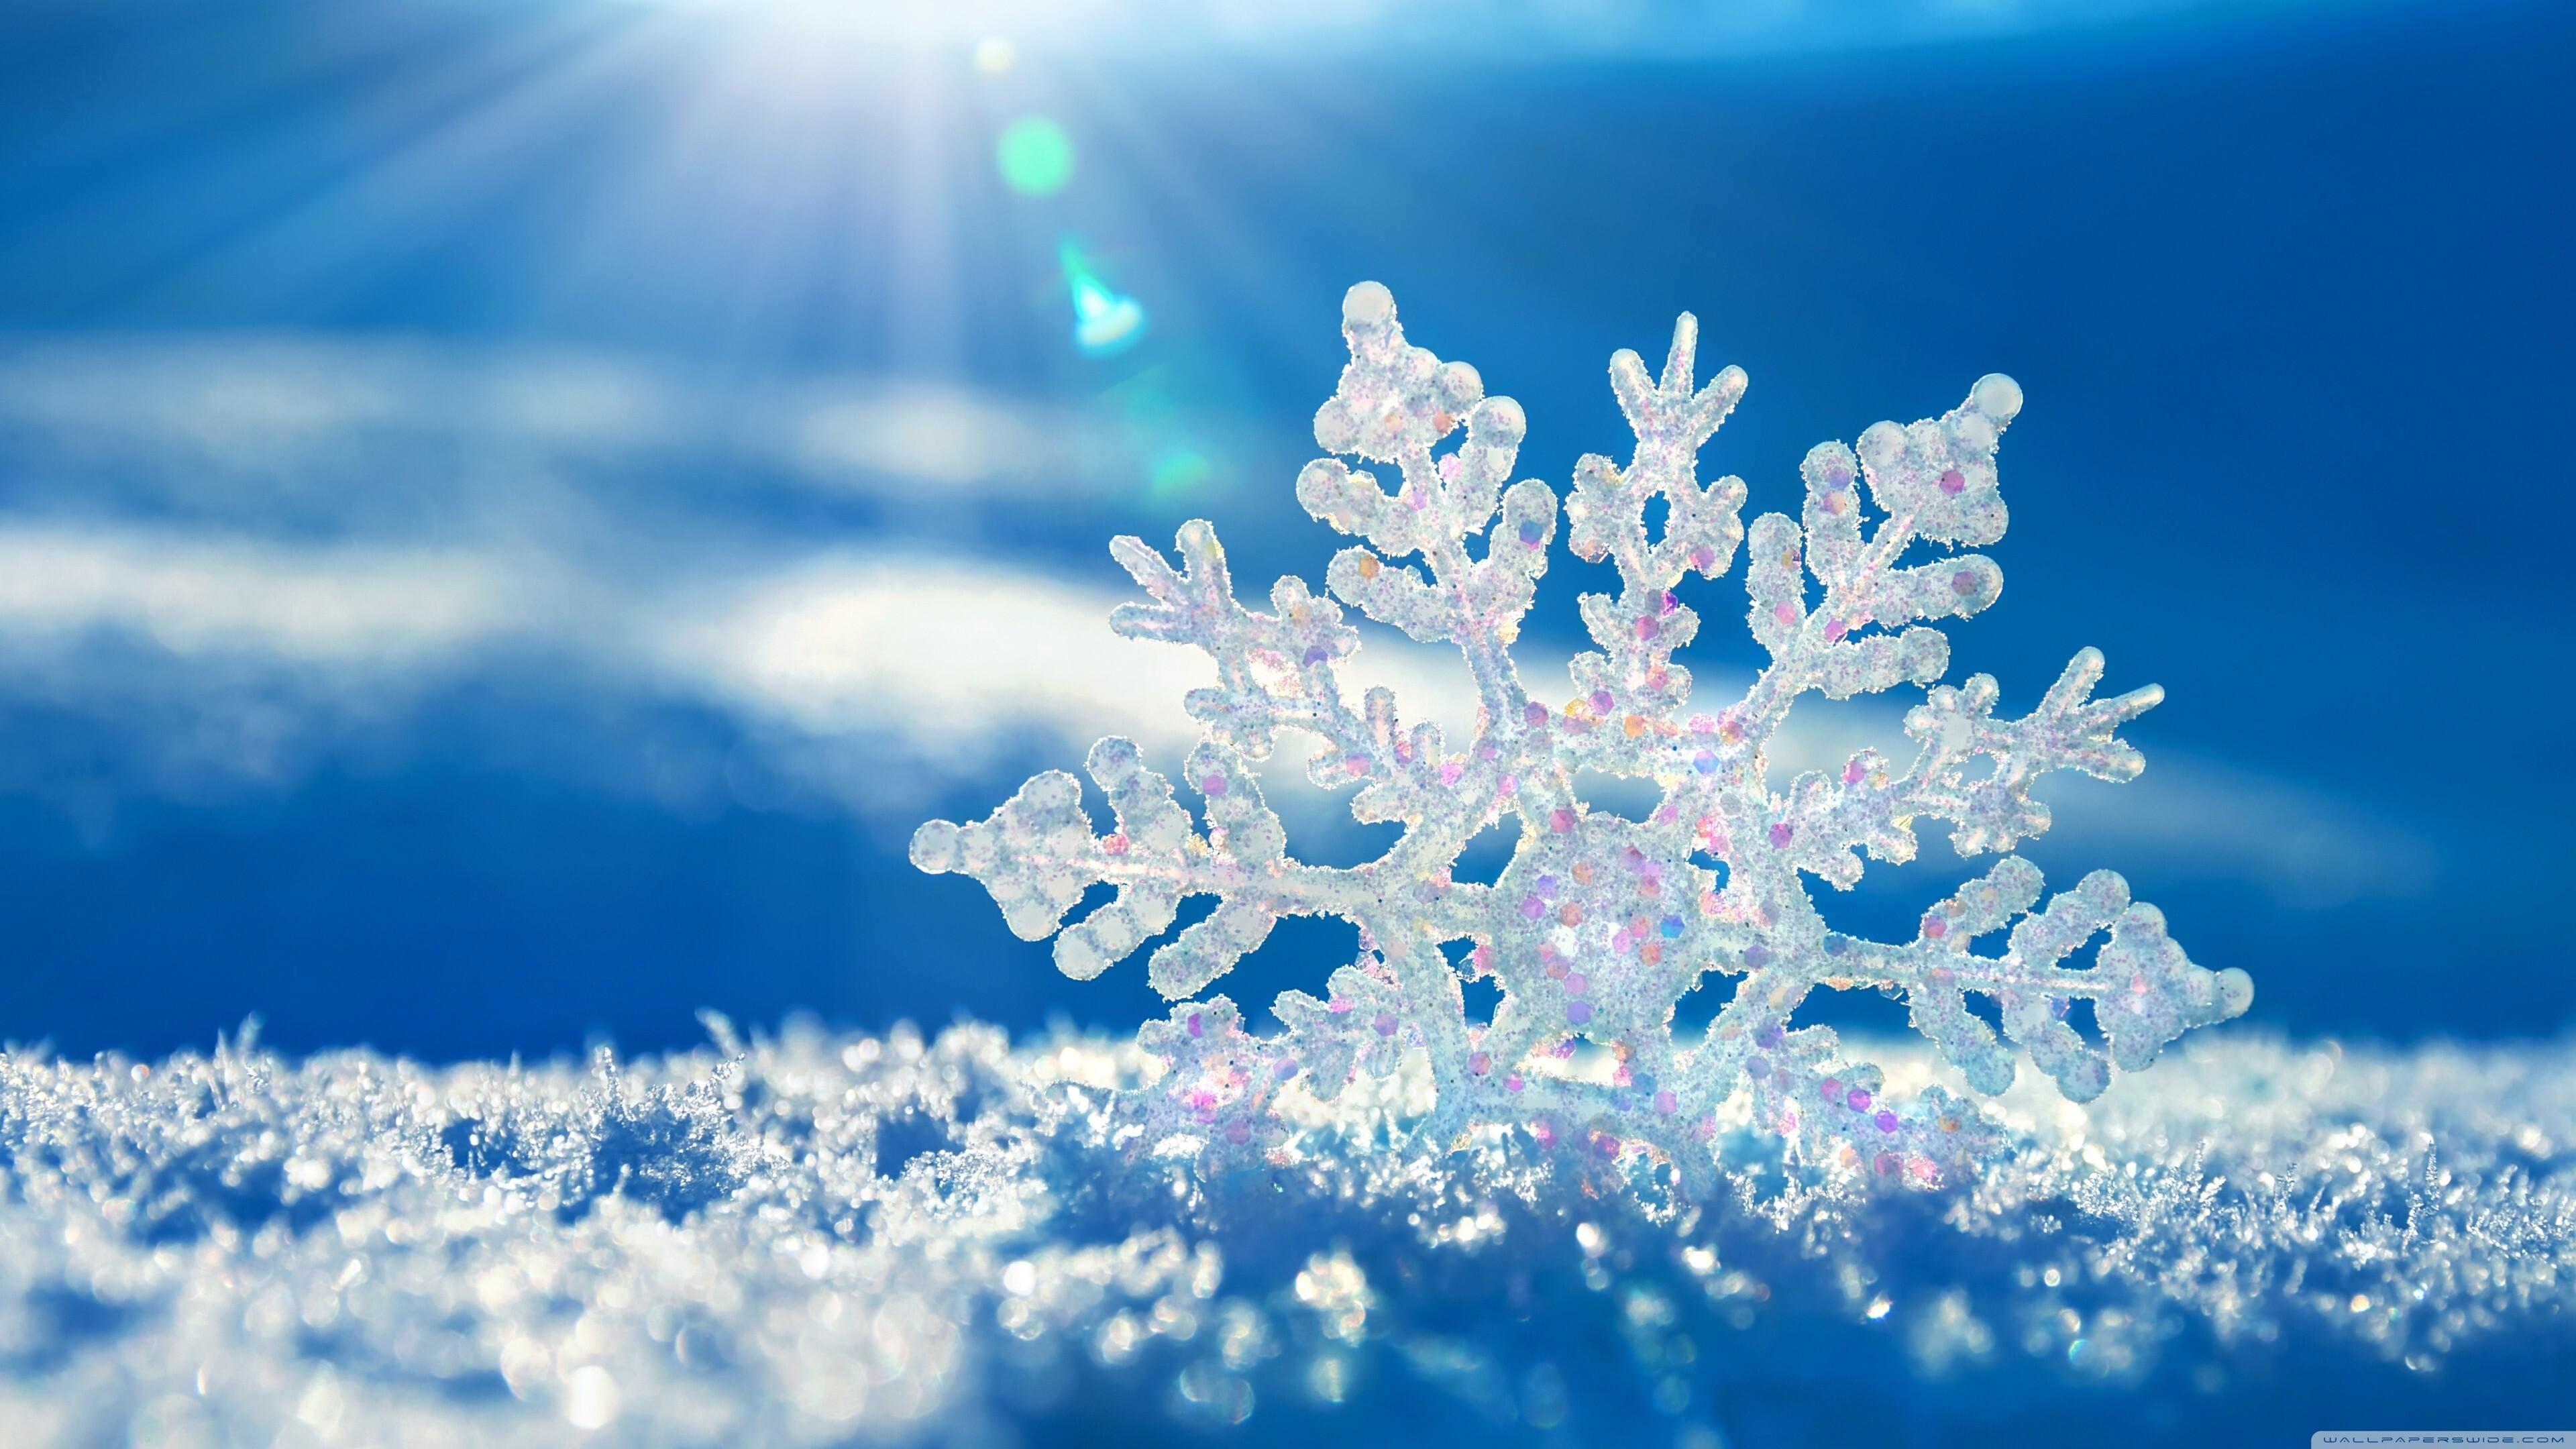 snowflakes-background.jpg